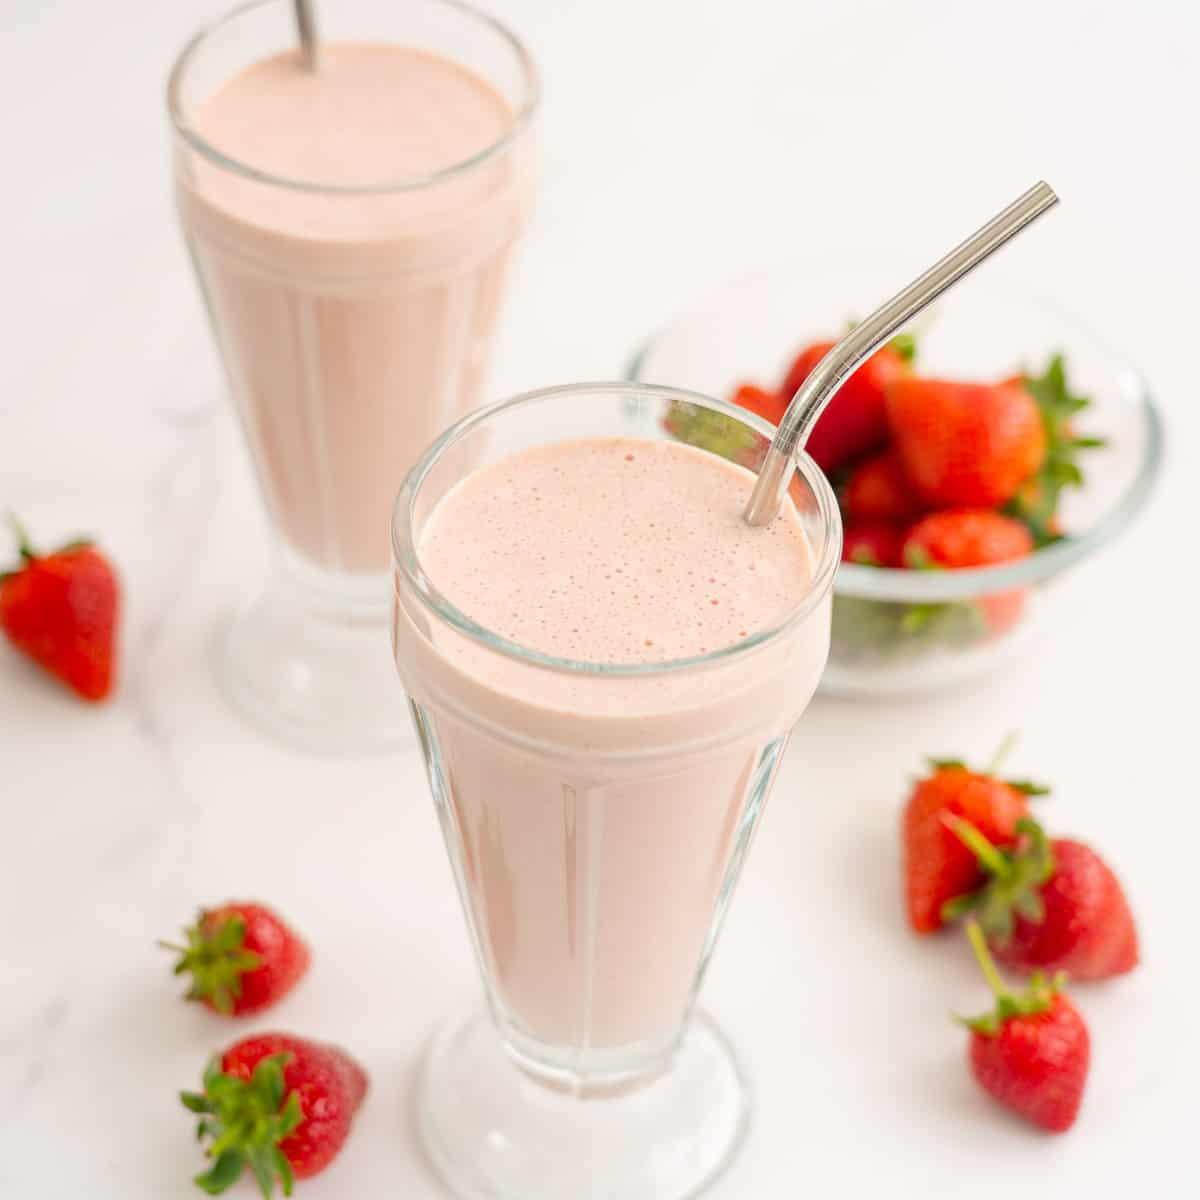 Two pink strawberry milkshakes in tall ice cream sundae glasses.